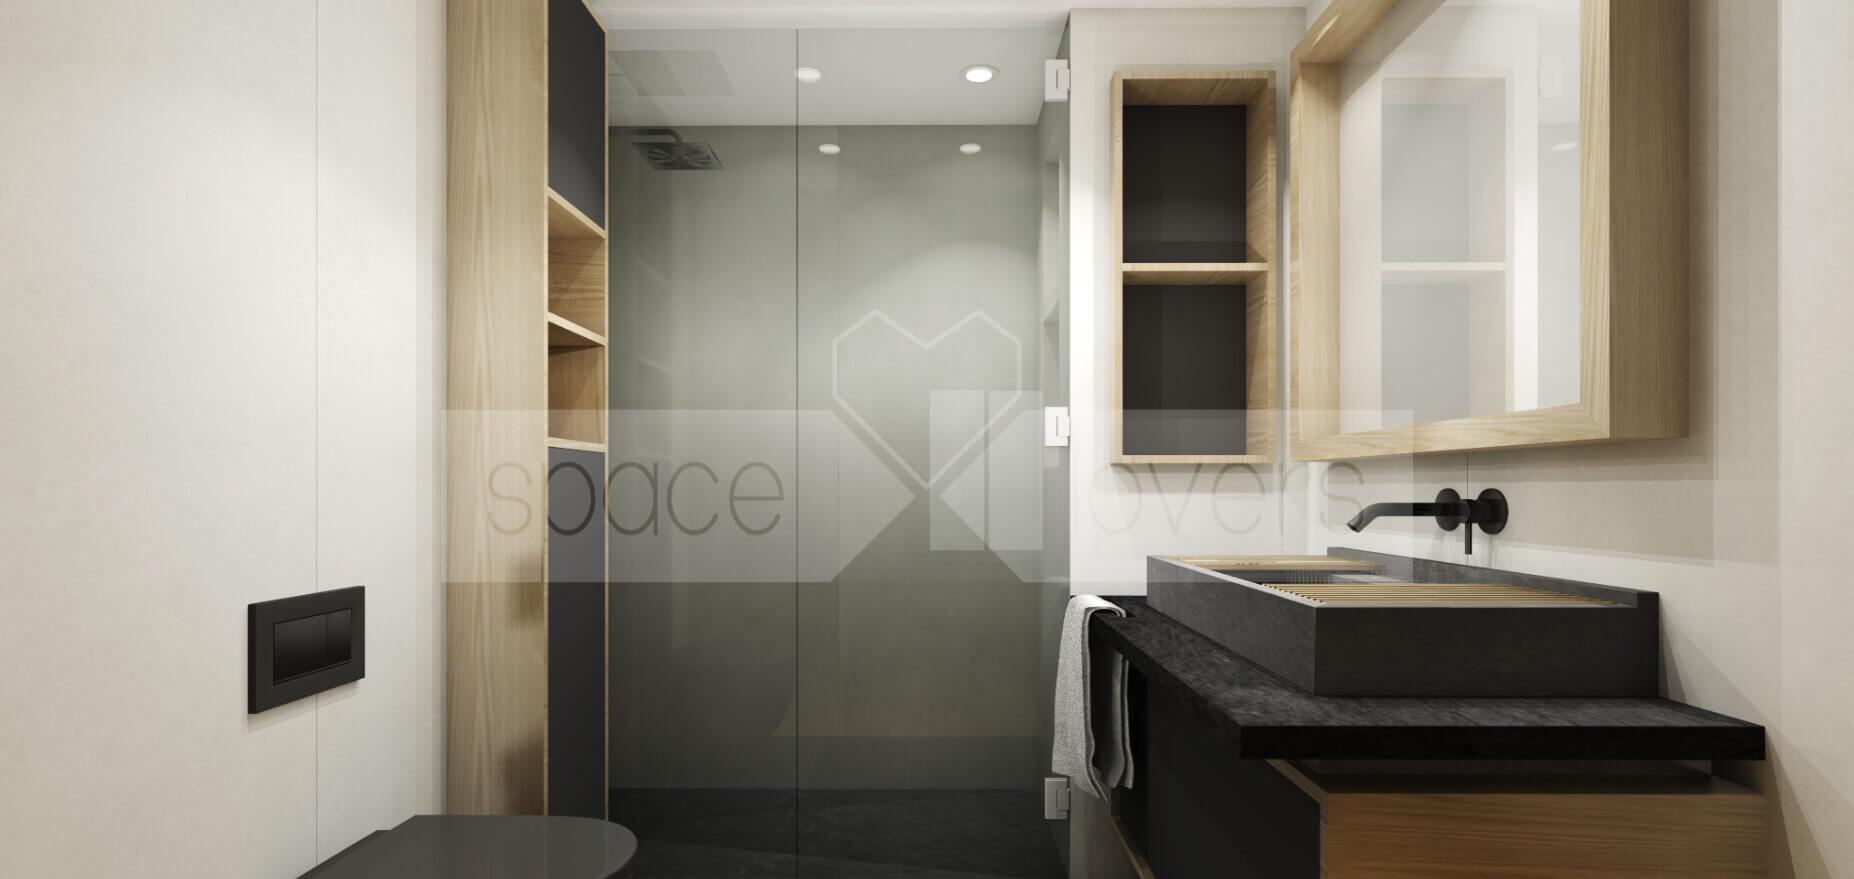 remodelacao-apartamento-parque-das-nacoes-lisboa-casa-banho-suite-bancada-ardosia-nicho